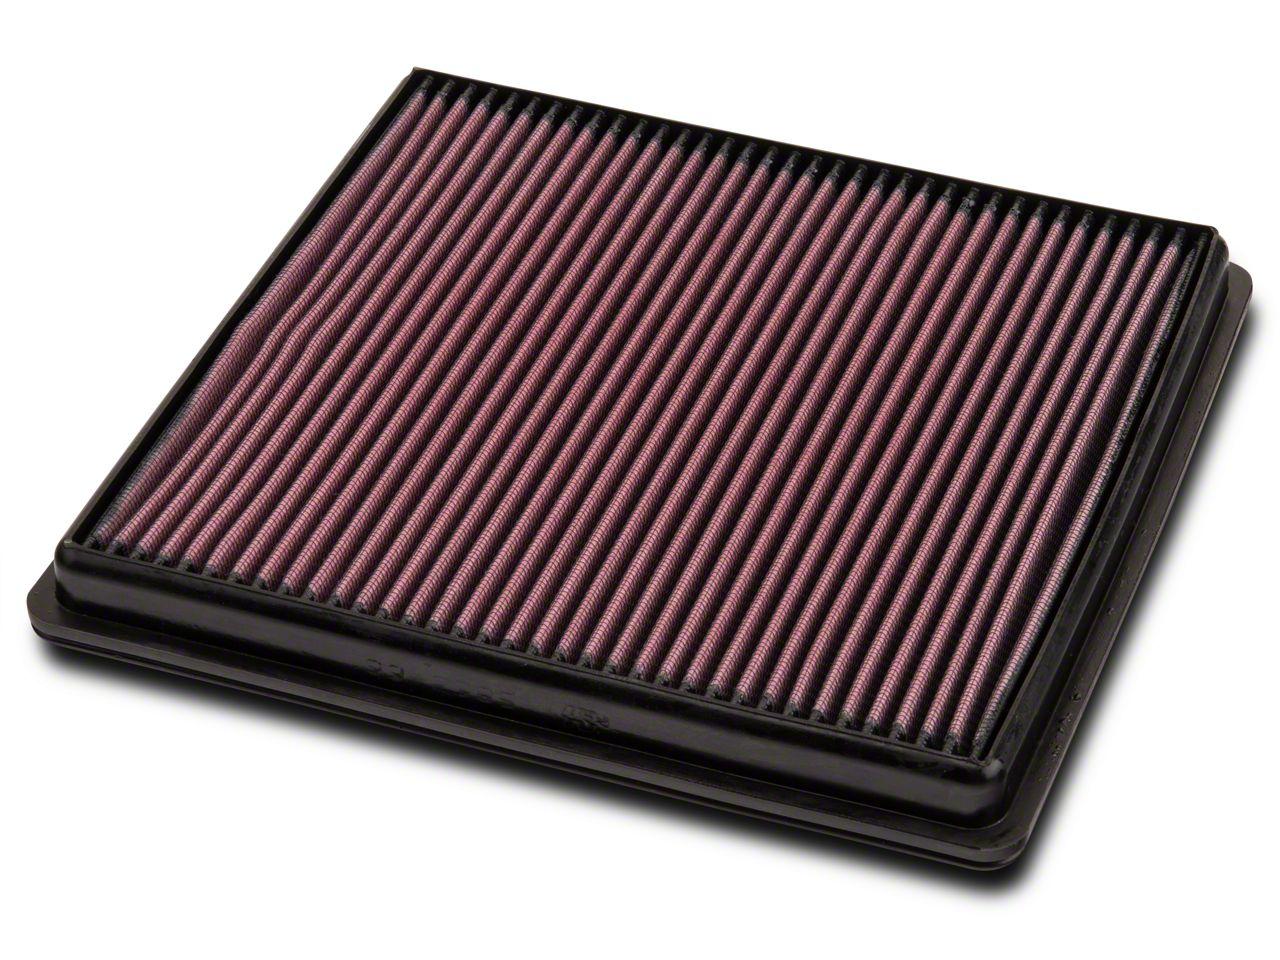 K&N Drop-In Replacement Air Filter (09-19 F-150)